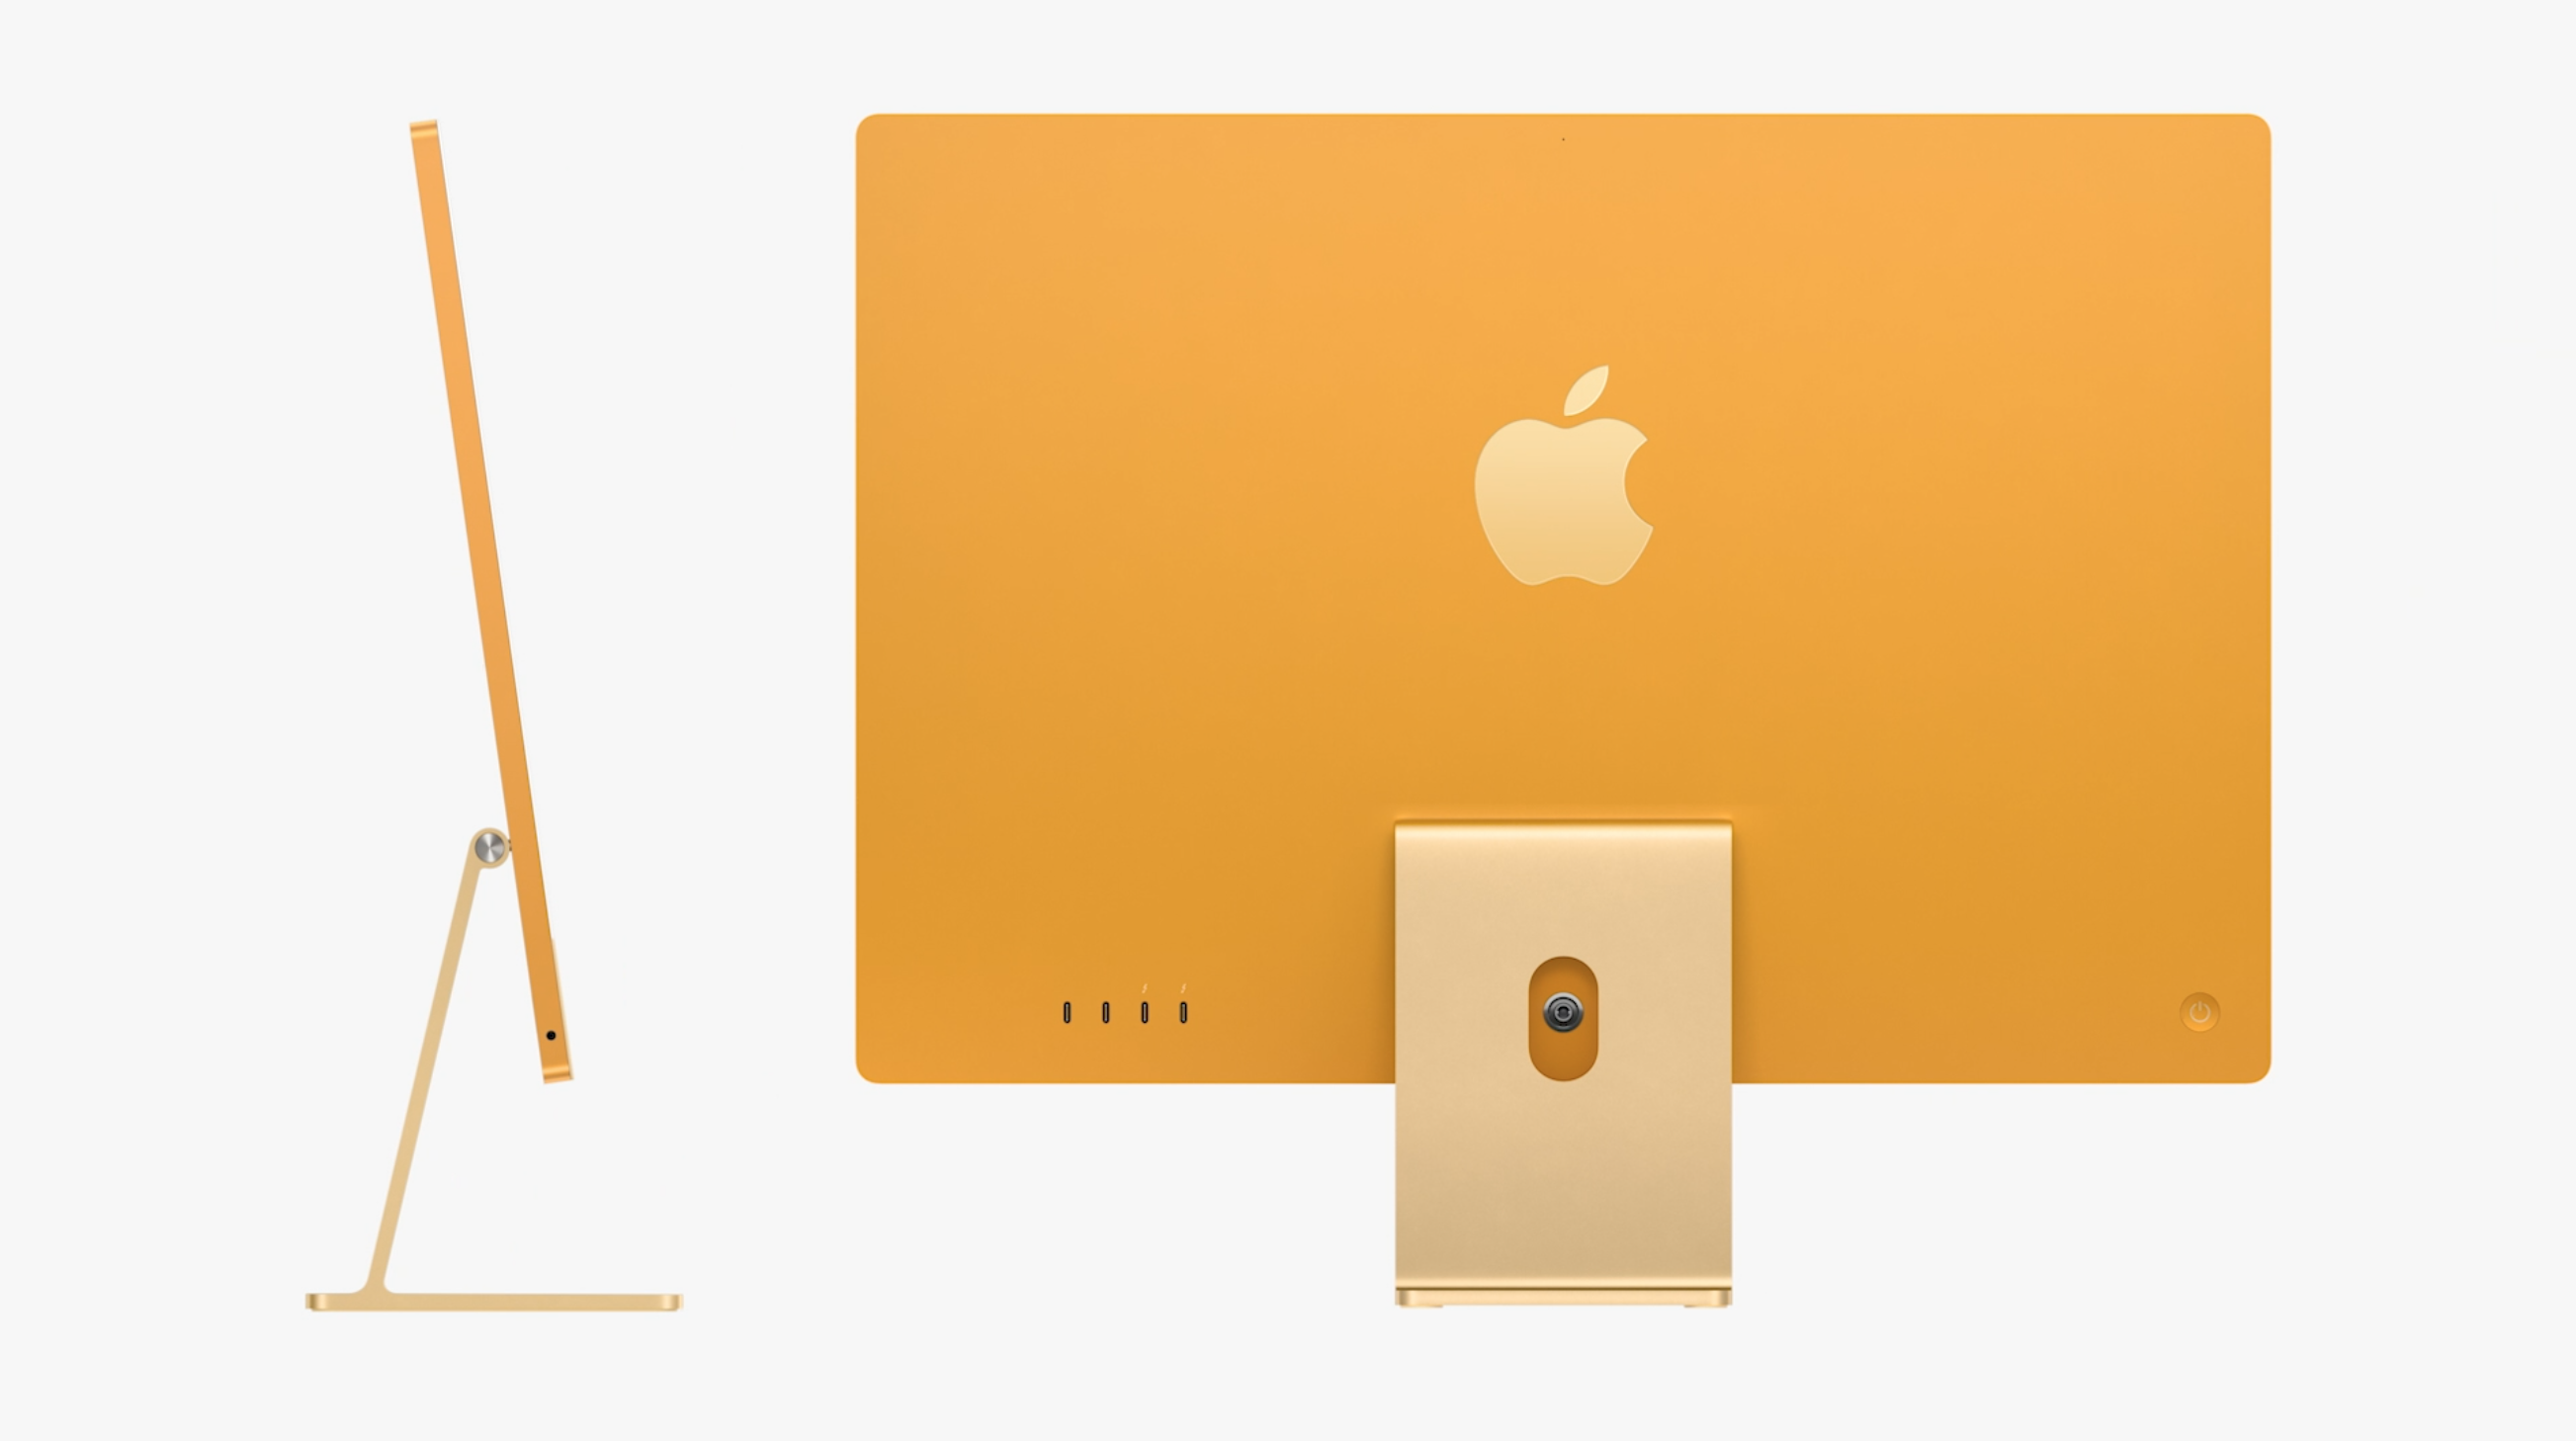 Apple iMac 2021 yellow